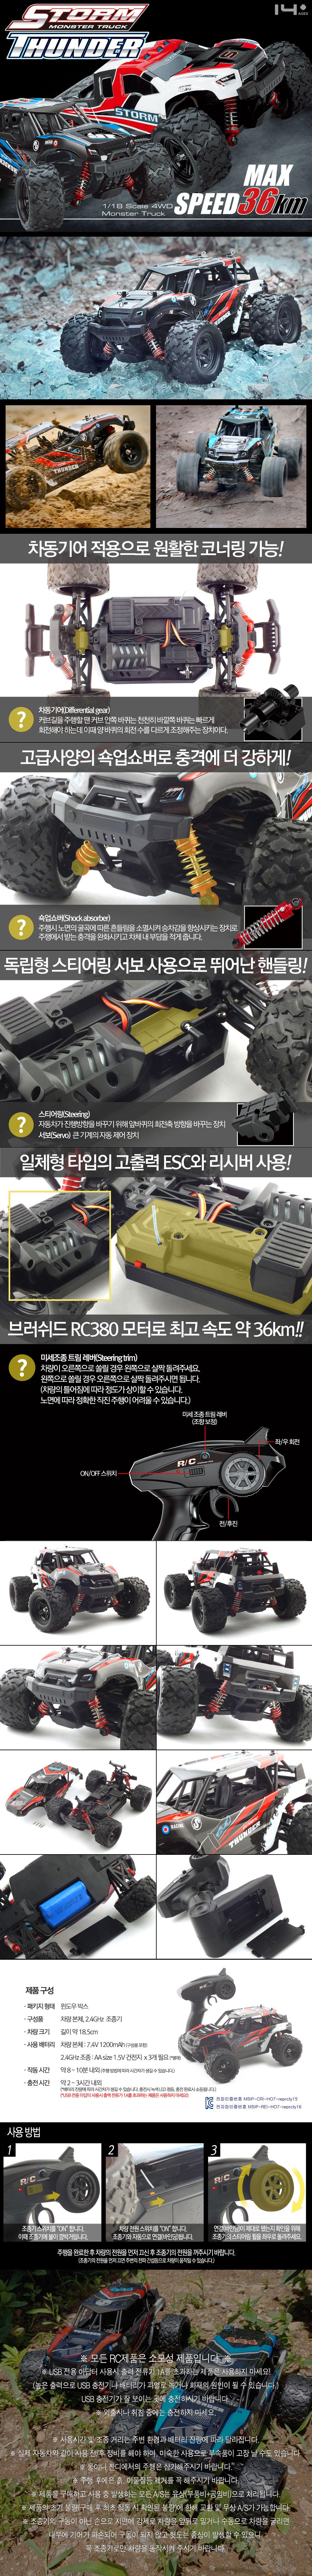 4WD 몬스터트럭 썬더 36kmh RTR 레드 RC카 - 레프리카, 120,000원, R/C 카, 전동 R/C카